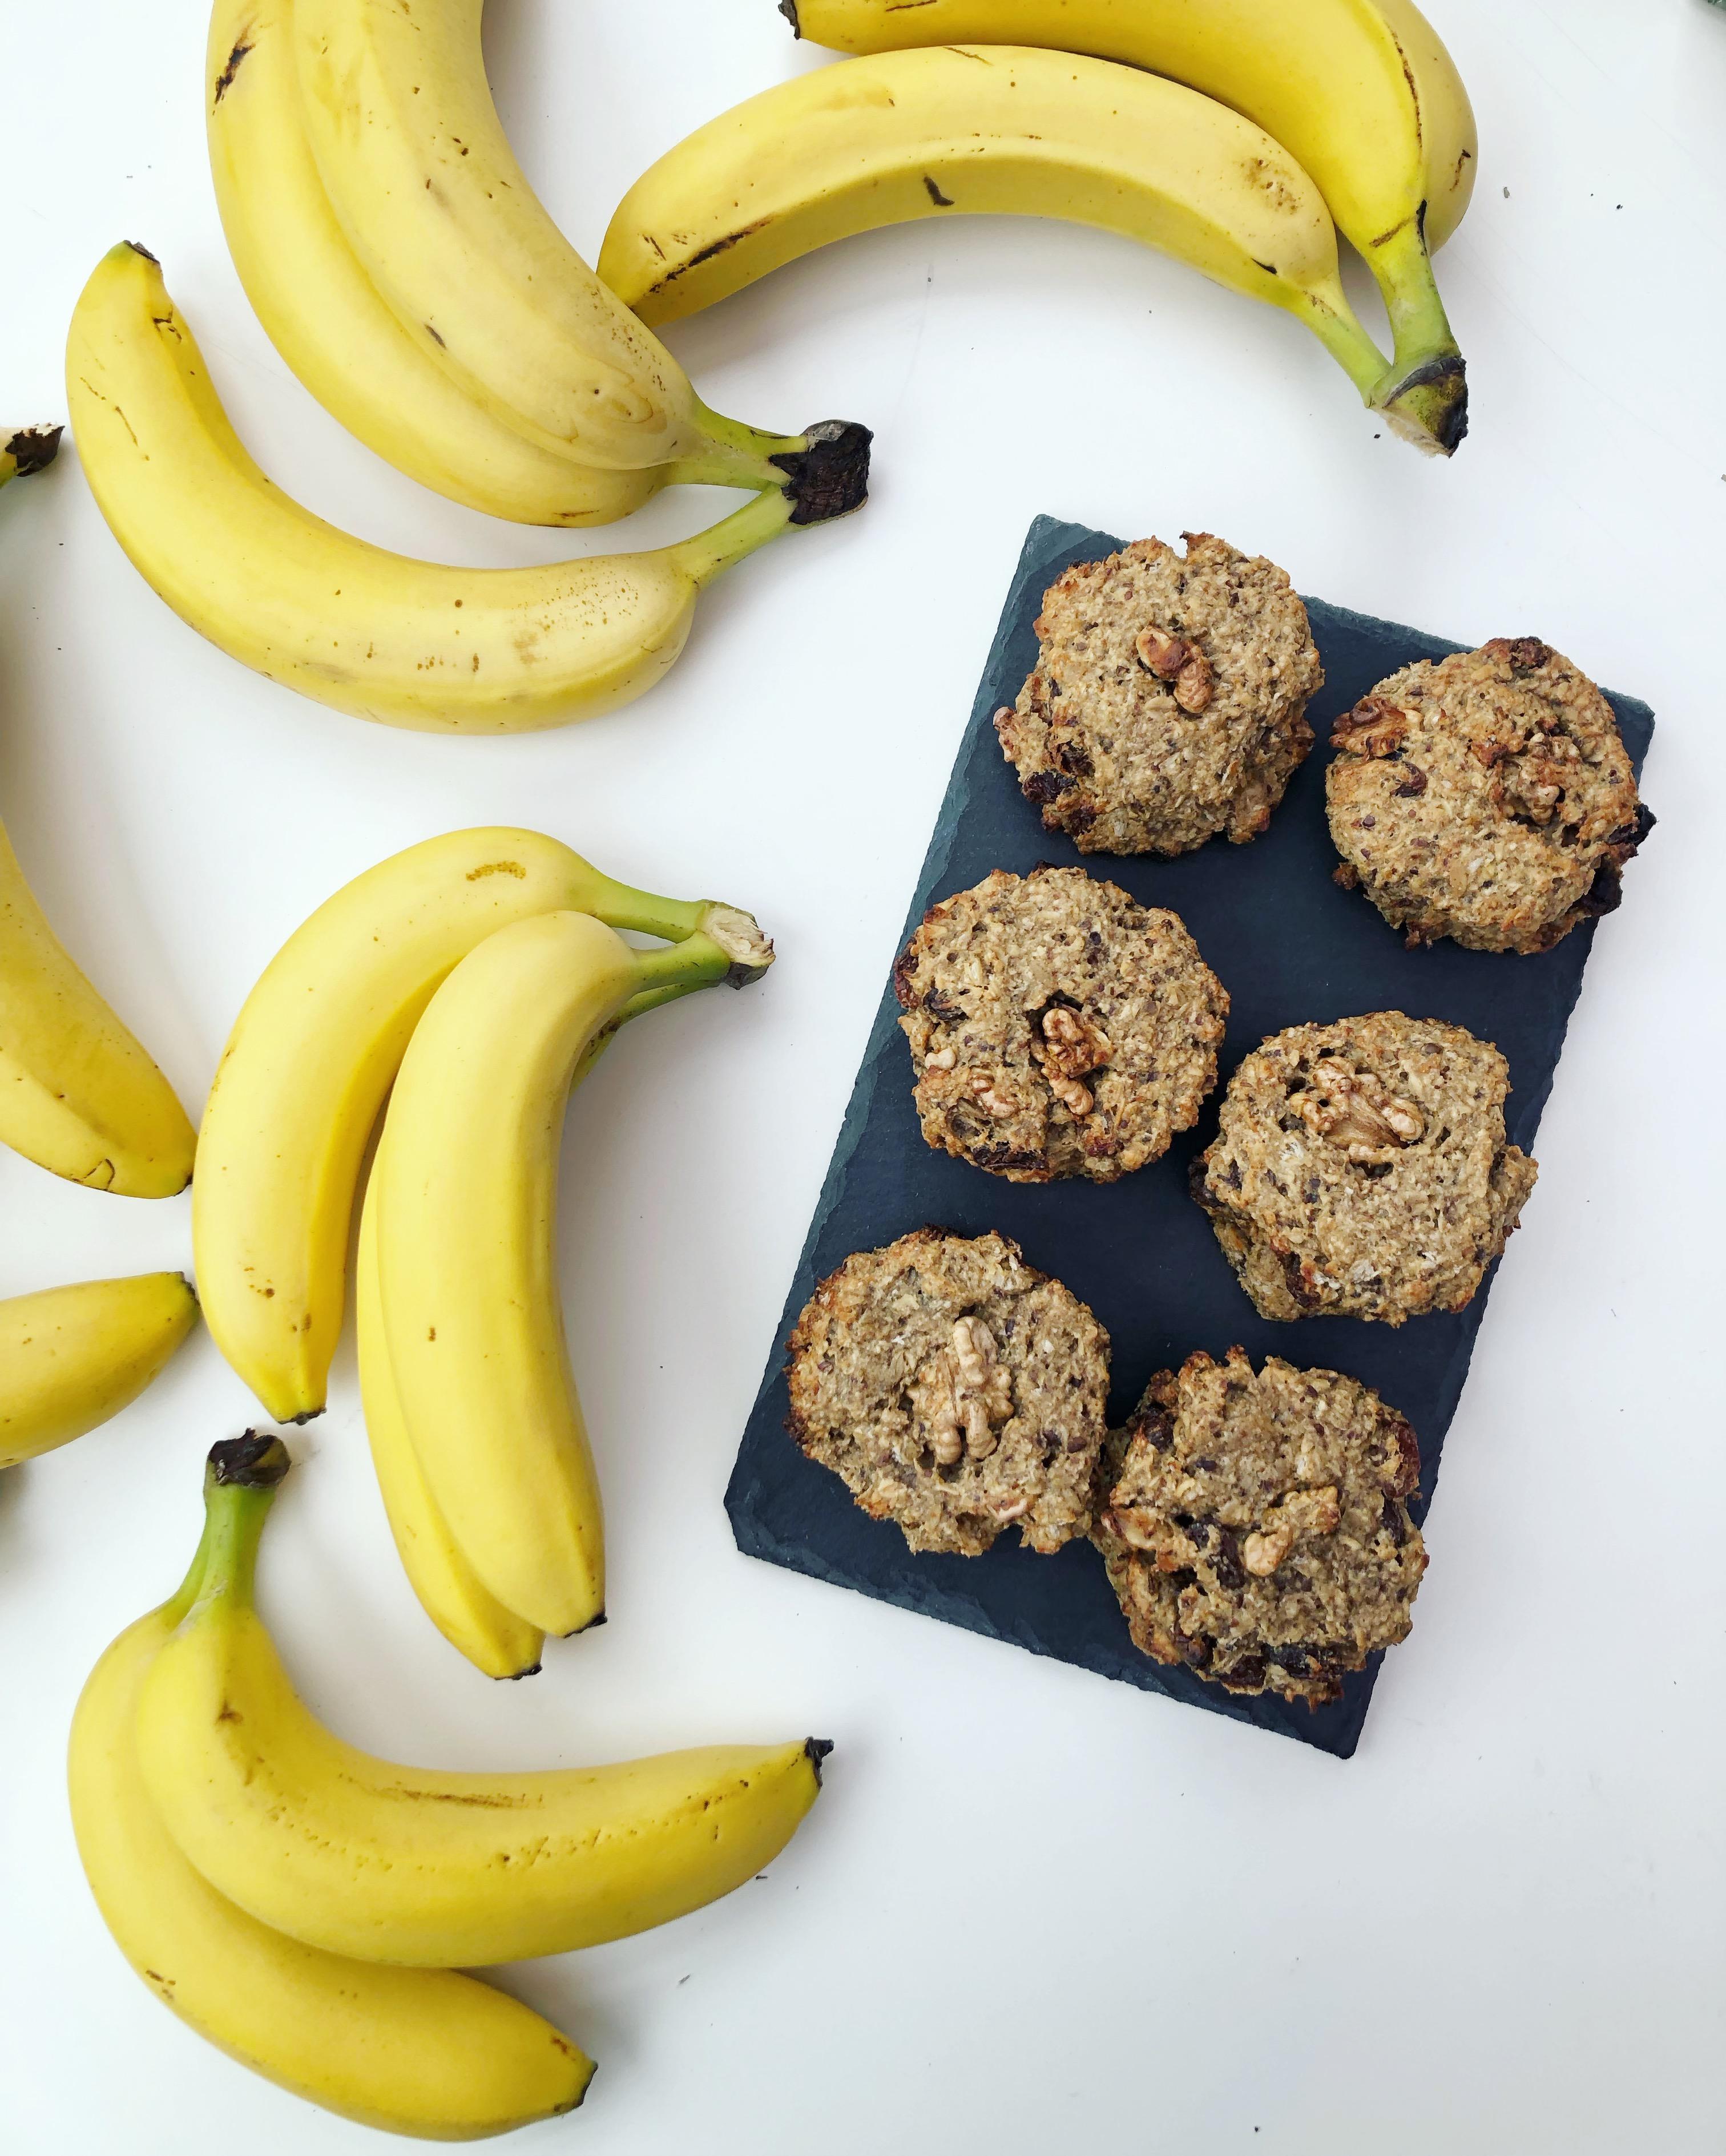 Vegan Banana Peanut Butter Cookies (bolachas veganas de banana e amendoim)